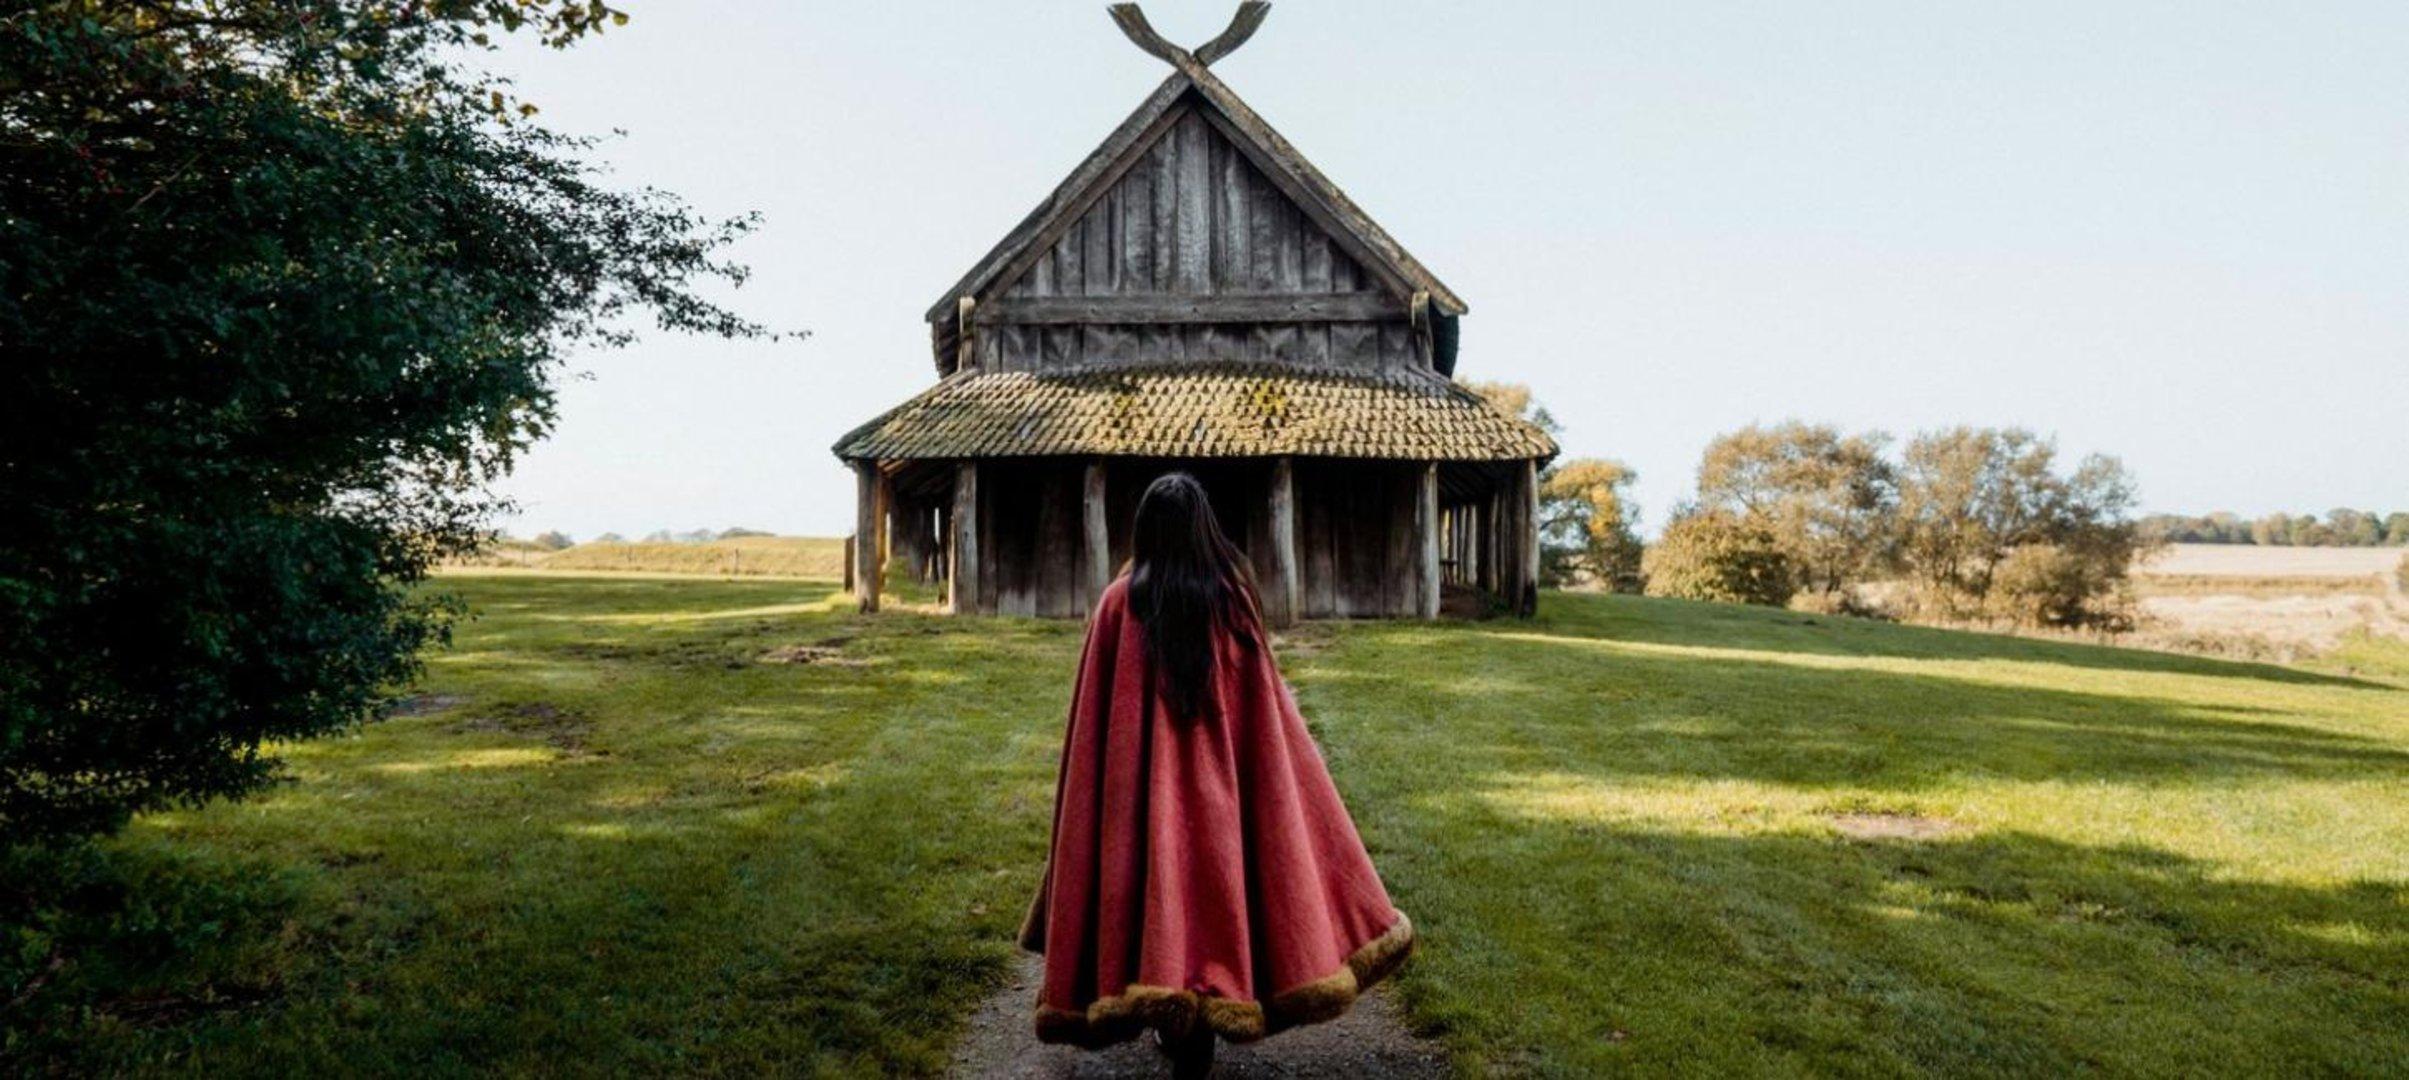 Top 12 Viking sites in Denmark Thumbnail